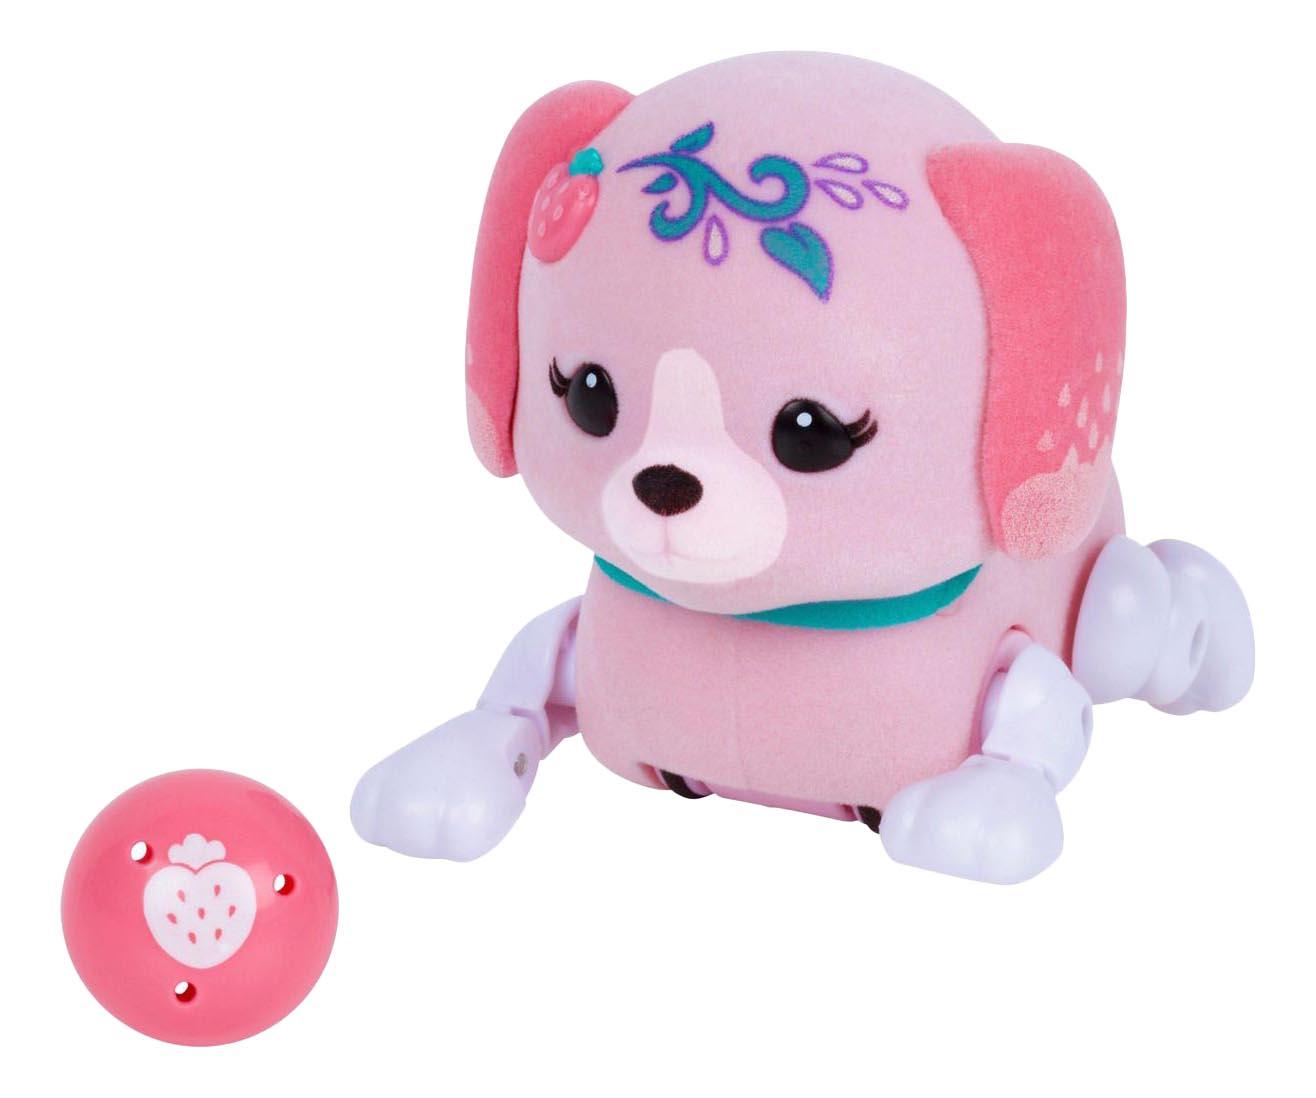 Интерактивная игрушка Щенок с мячиком Little Live Pets Клубничка